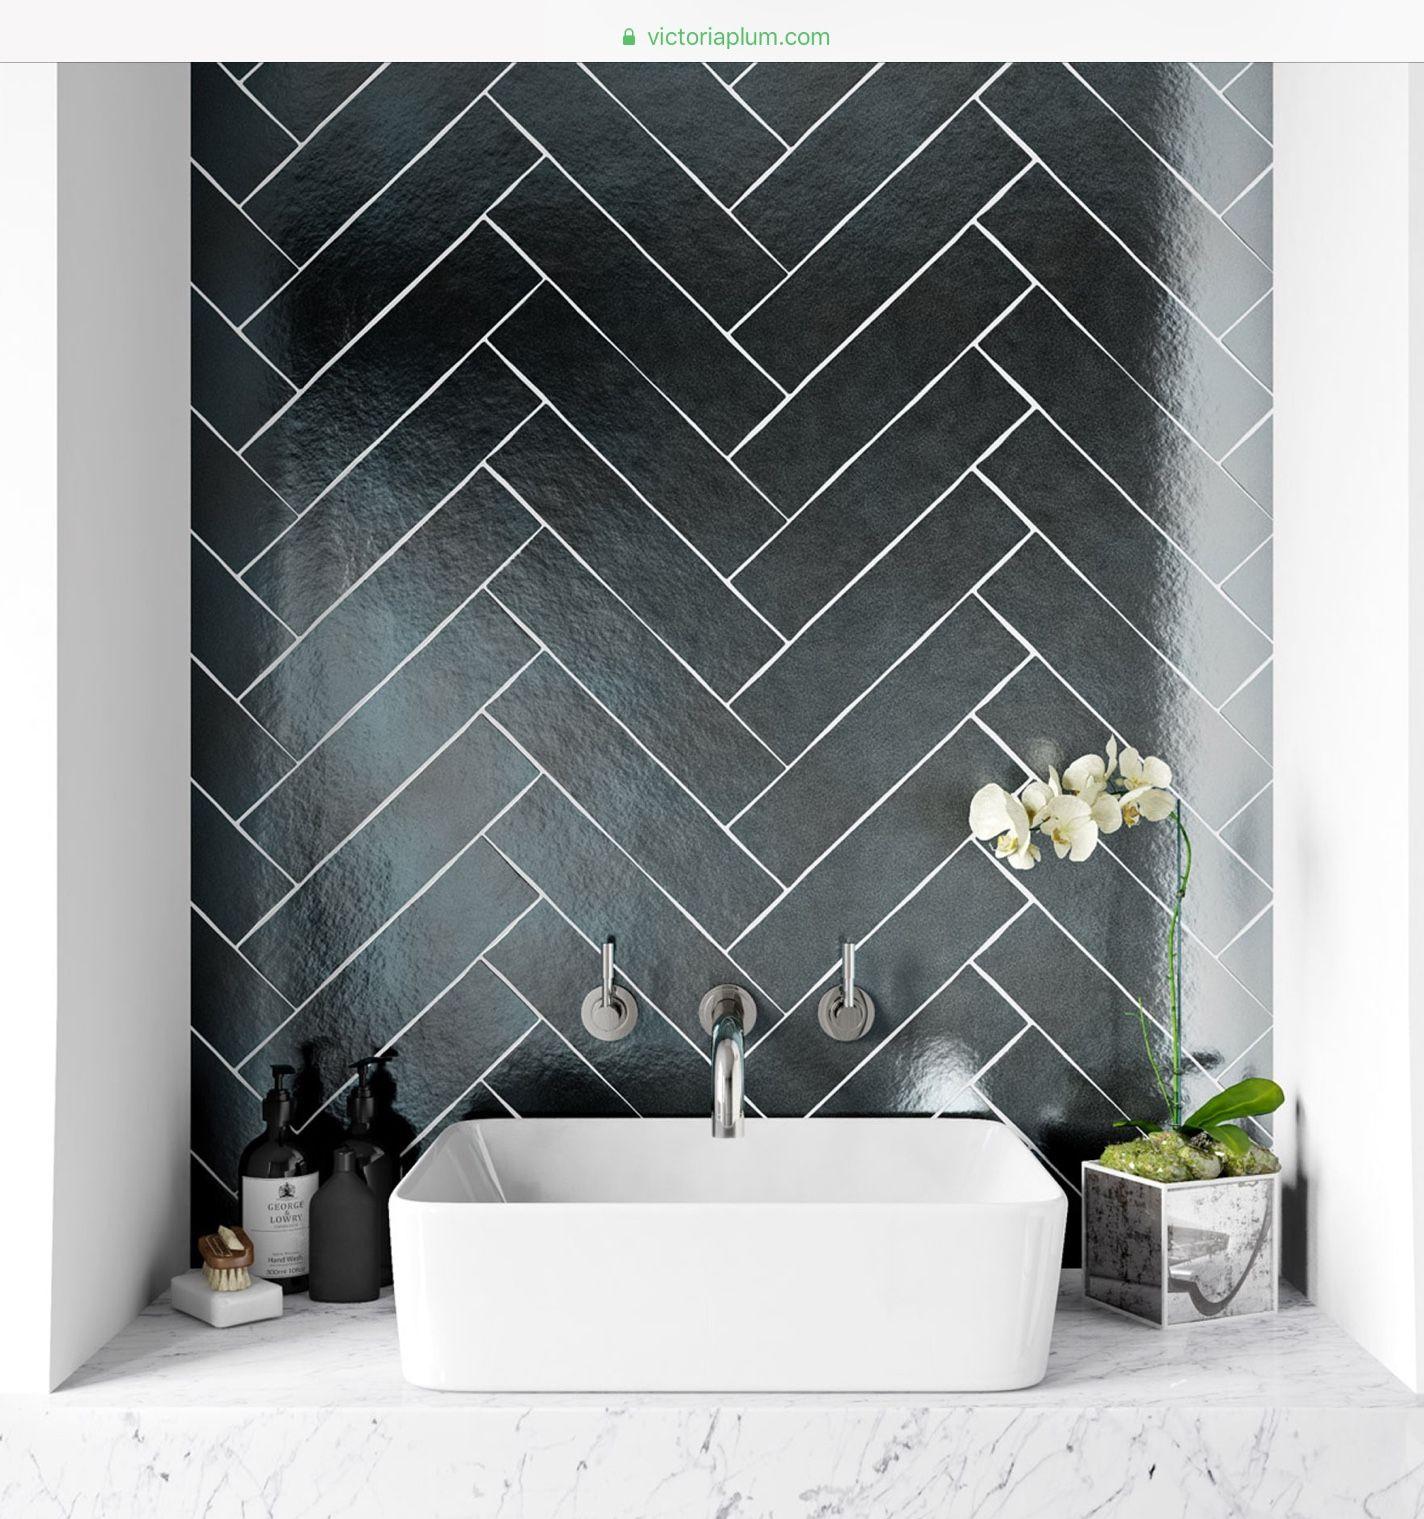 Pin By Rita Grendė On Vaiki Vonia Metallic Tiles Bathroom